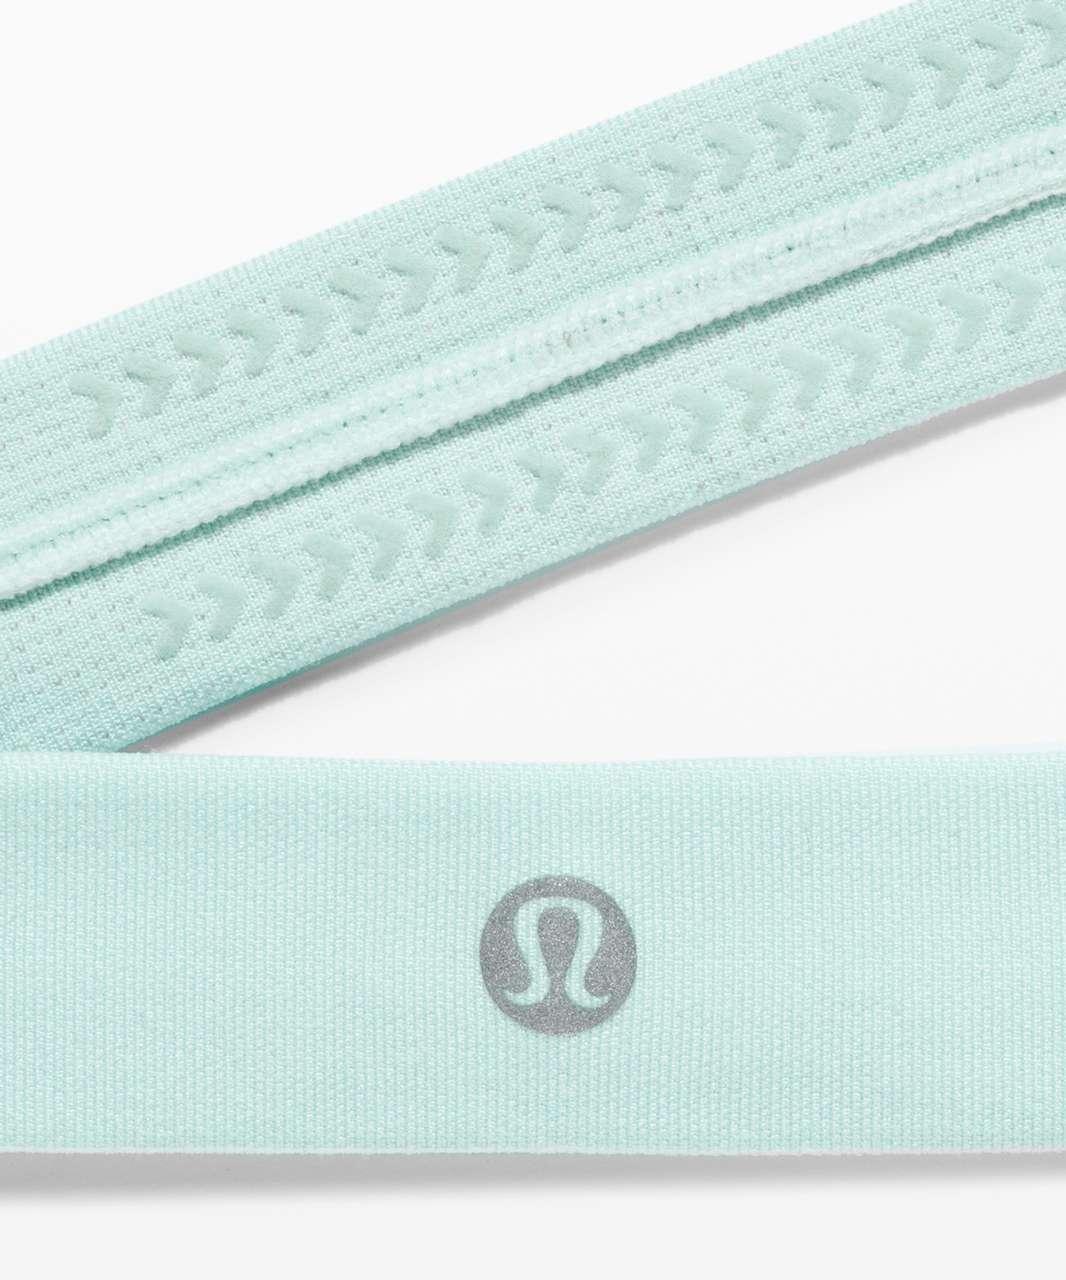 Lululemon Cardio Cross Trainer Headband - Blue Glow / White